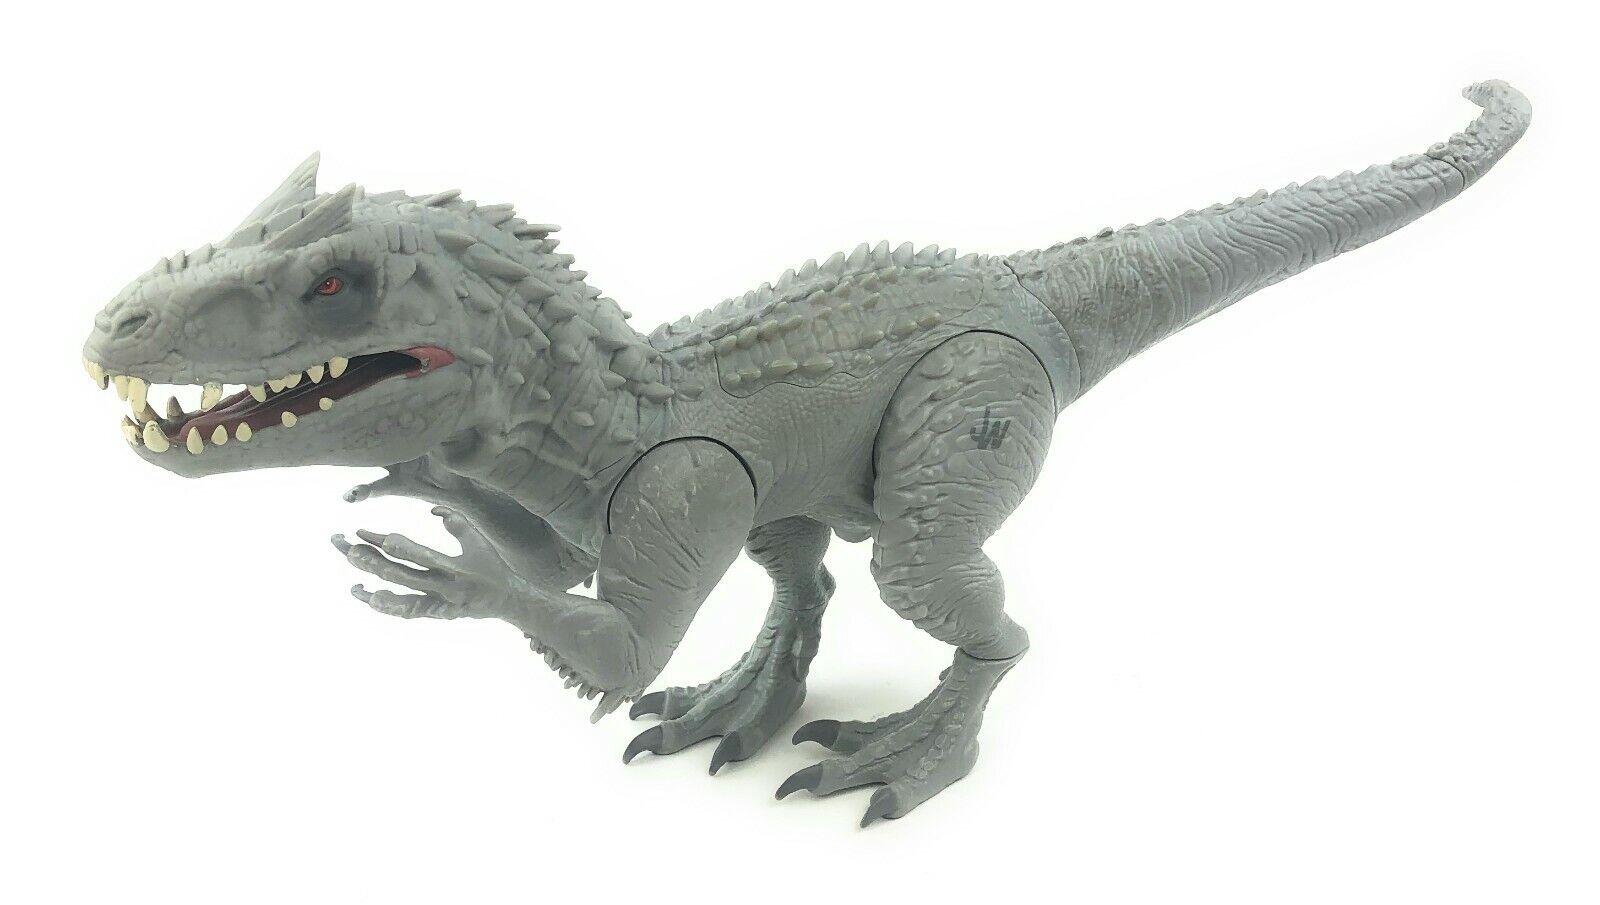 "2014 Hasbro Jurassic World Indominus Rex 20"" Dinosaur Toy w  Lights and Sound"